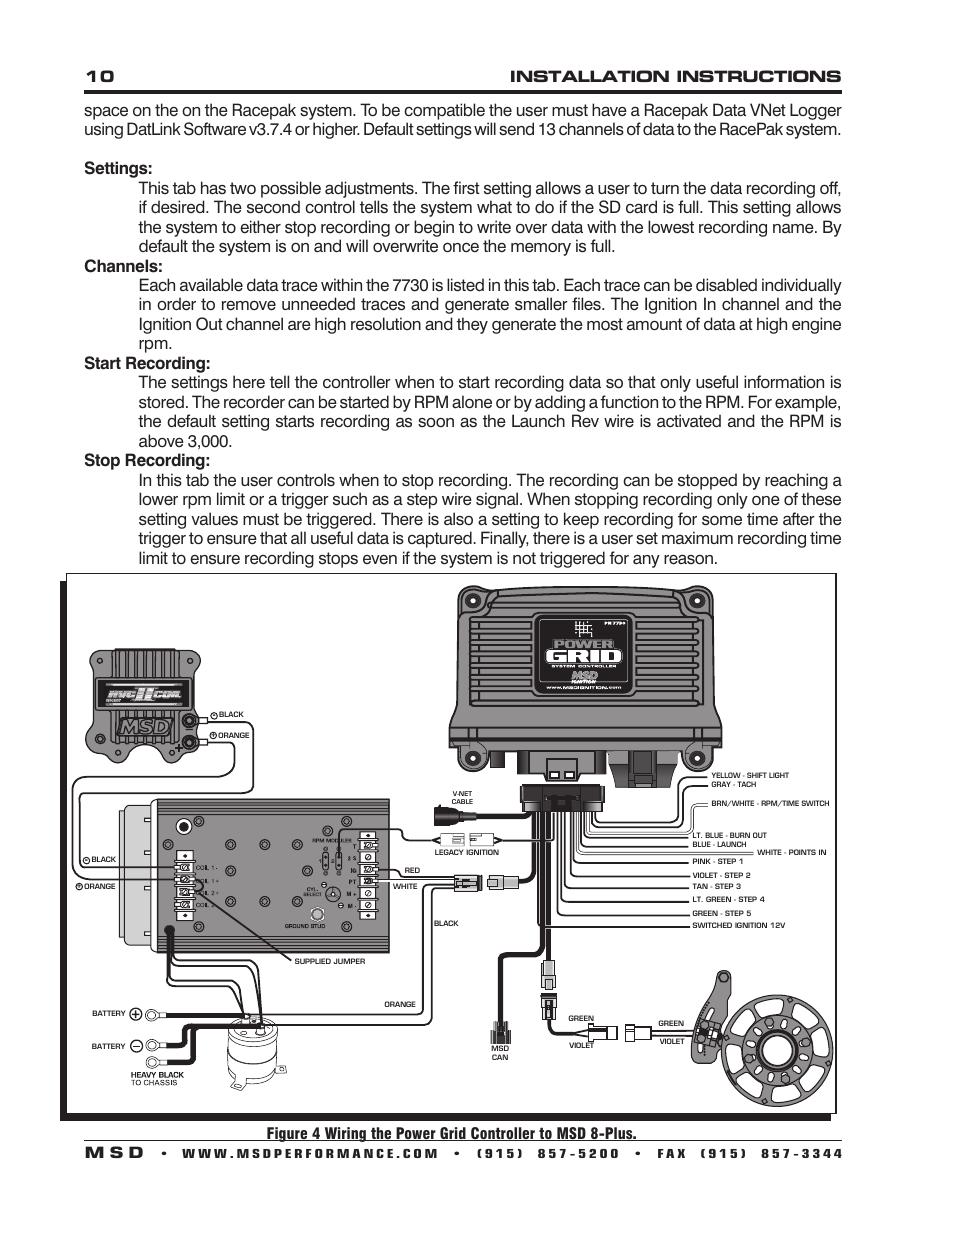 medium resolution of msd power grid wiring diagram wiring diagram sheet msd grid wiring diagram wiring diagram msd power